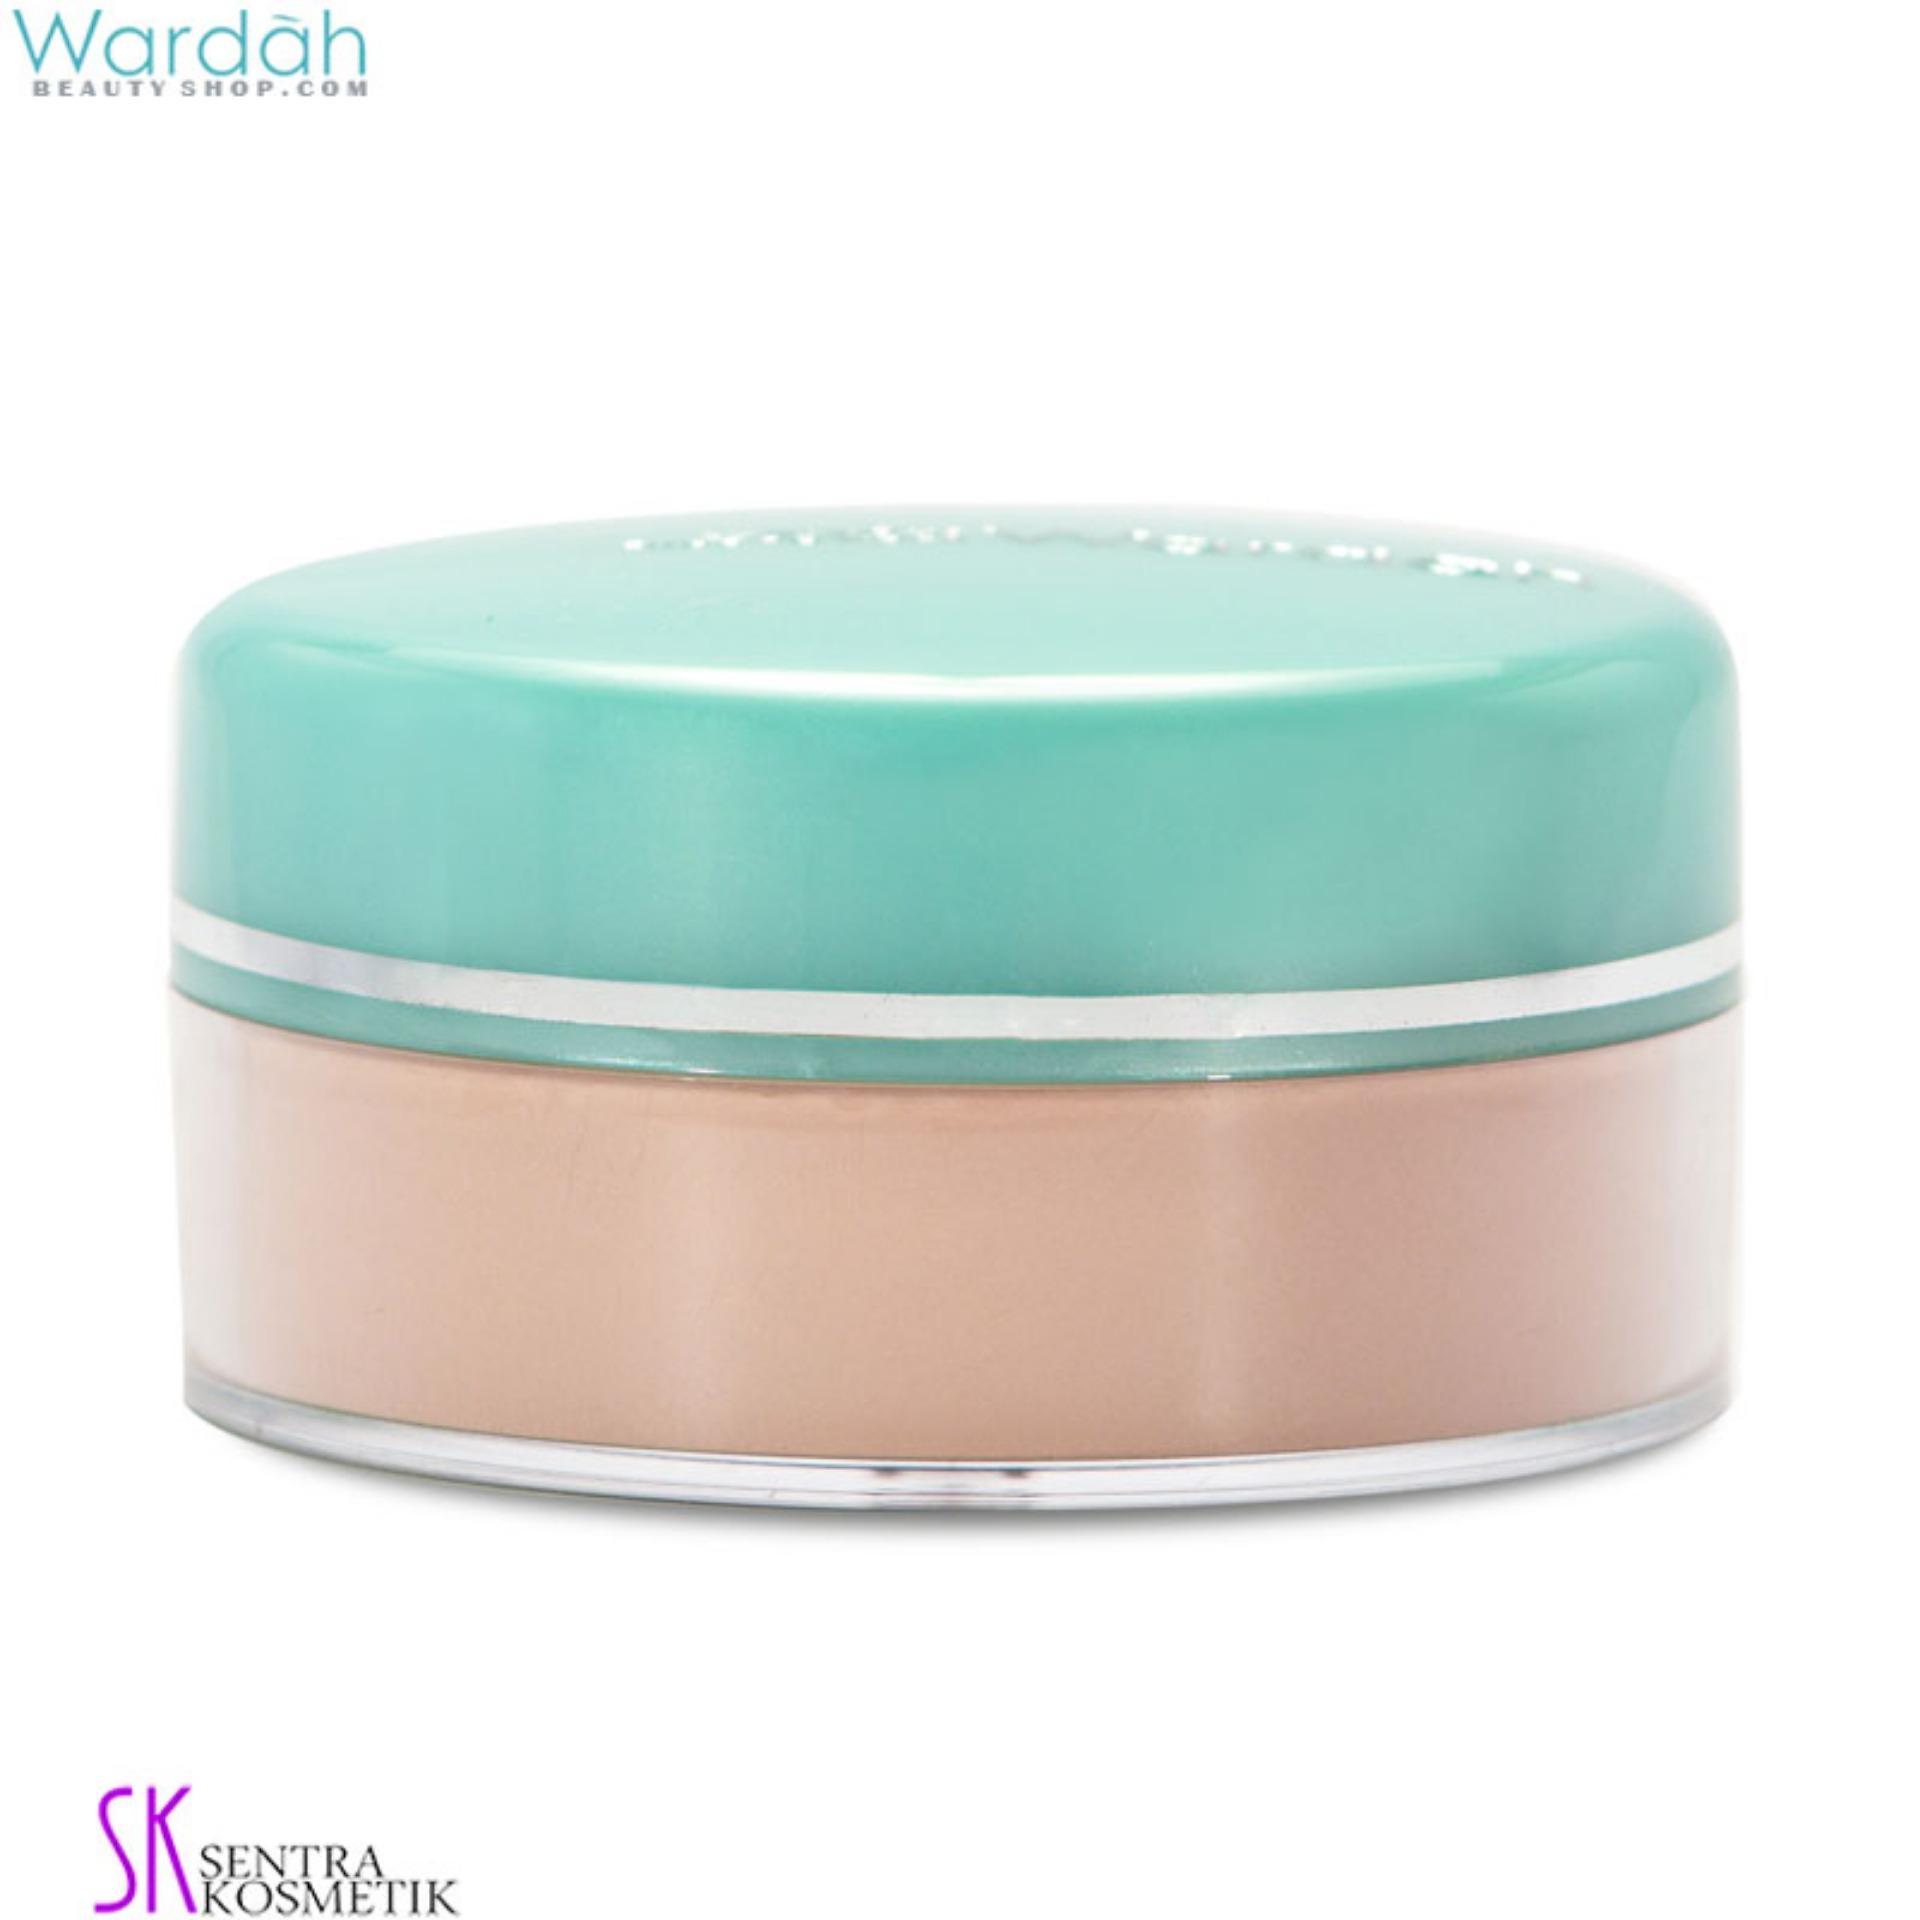 Wardah Everyday Luminous Face Powder 04 - Natural